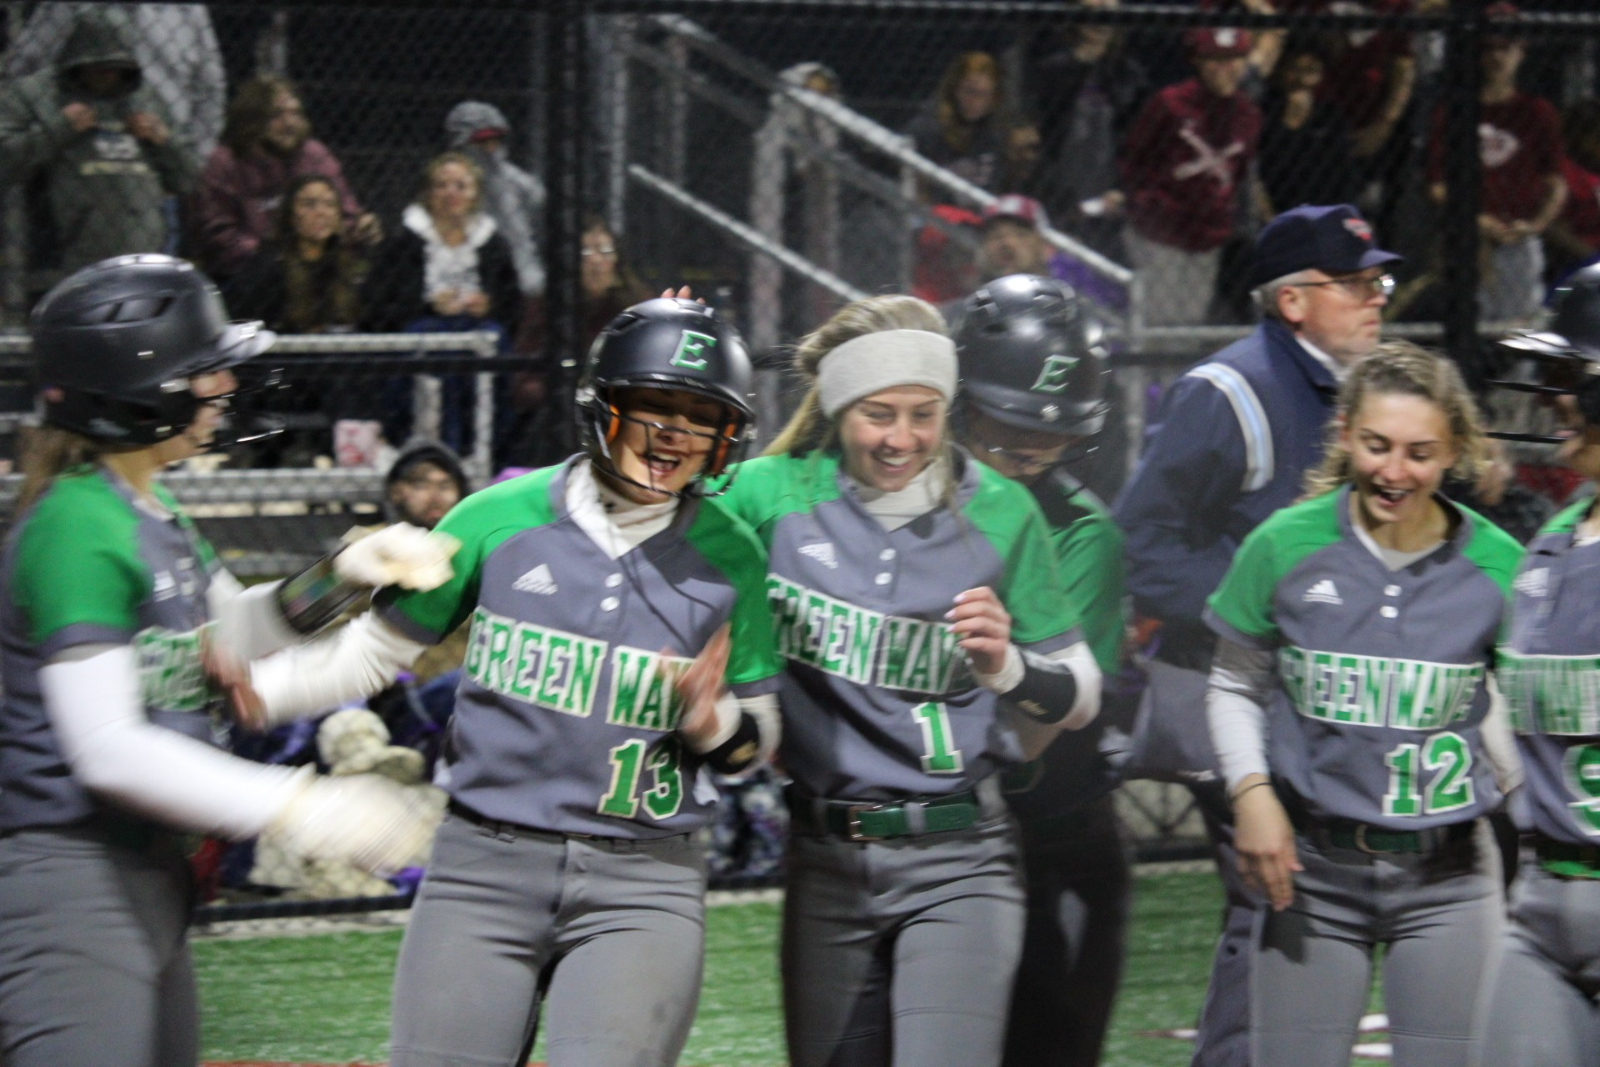 PHOTO GALLERY: Softball vs Westside